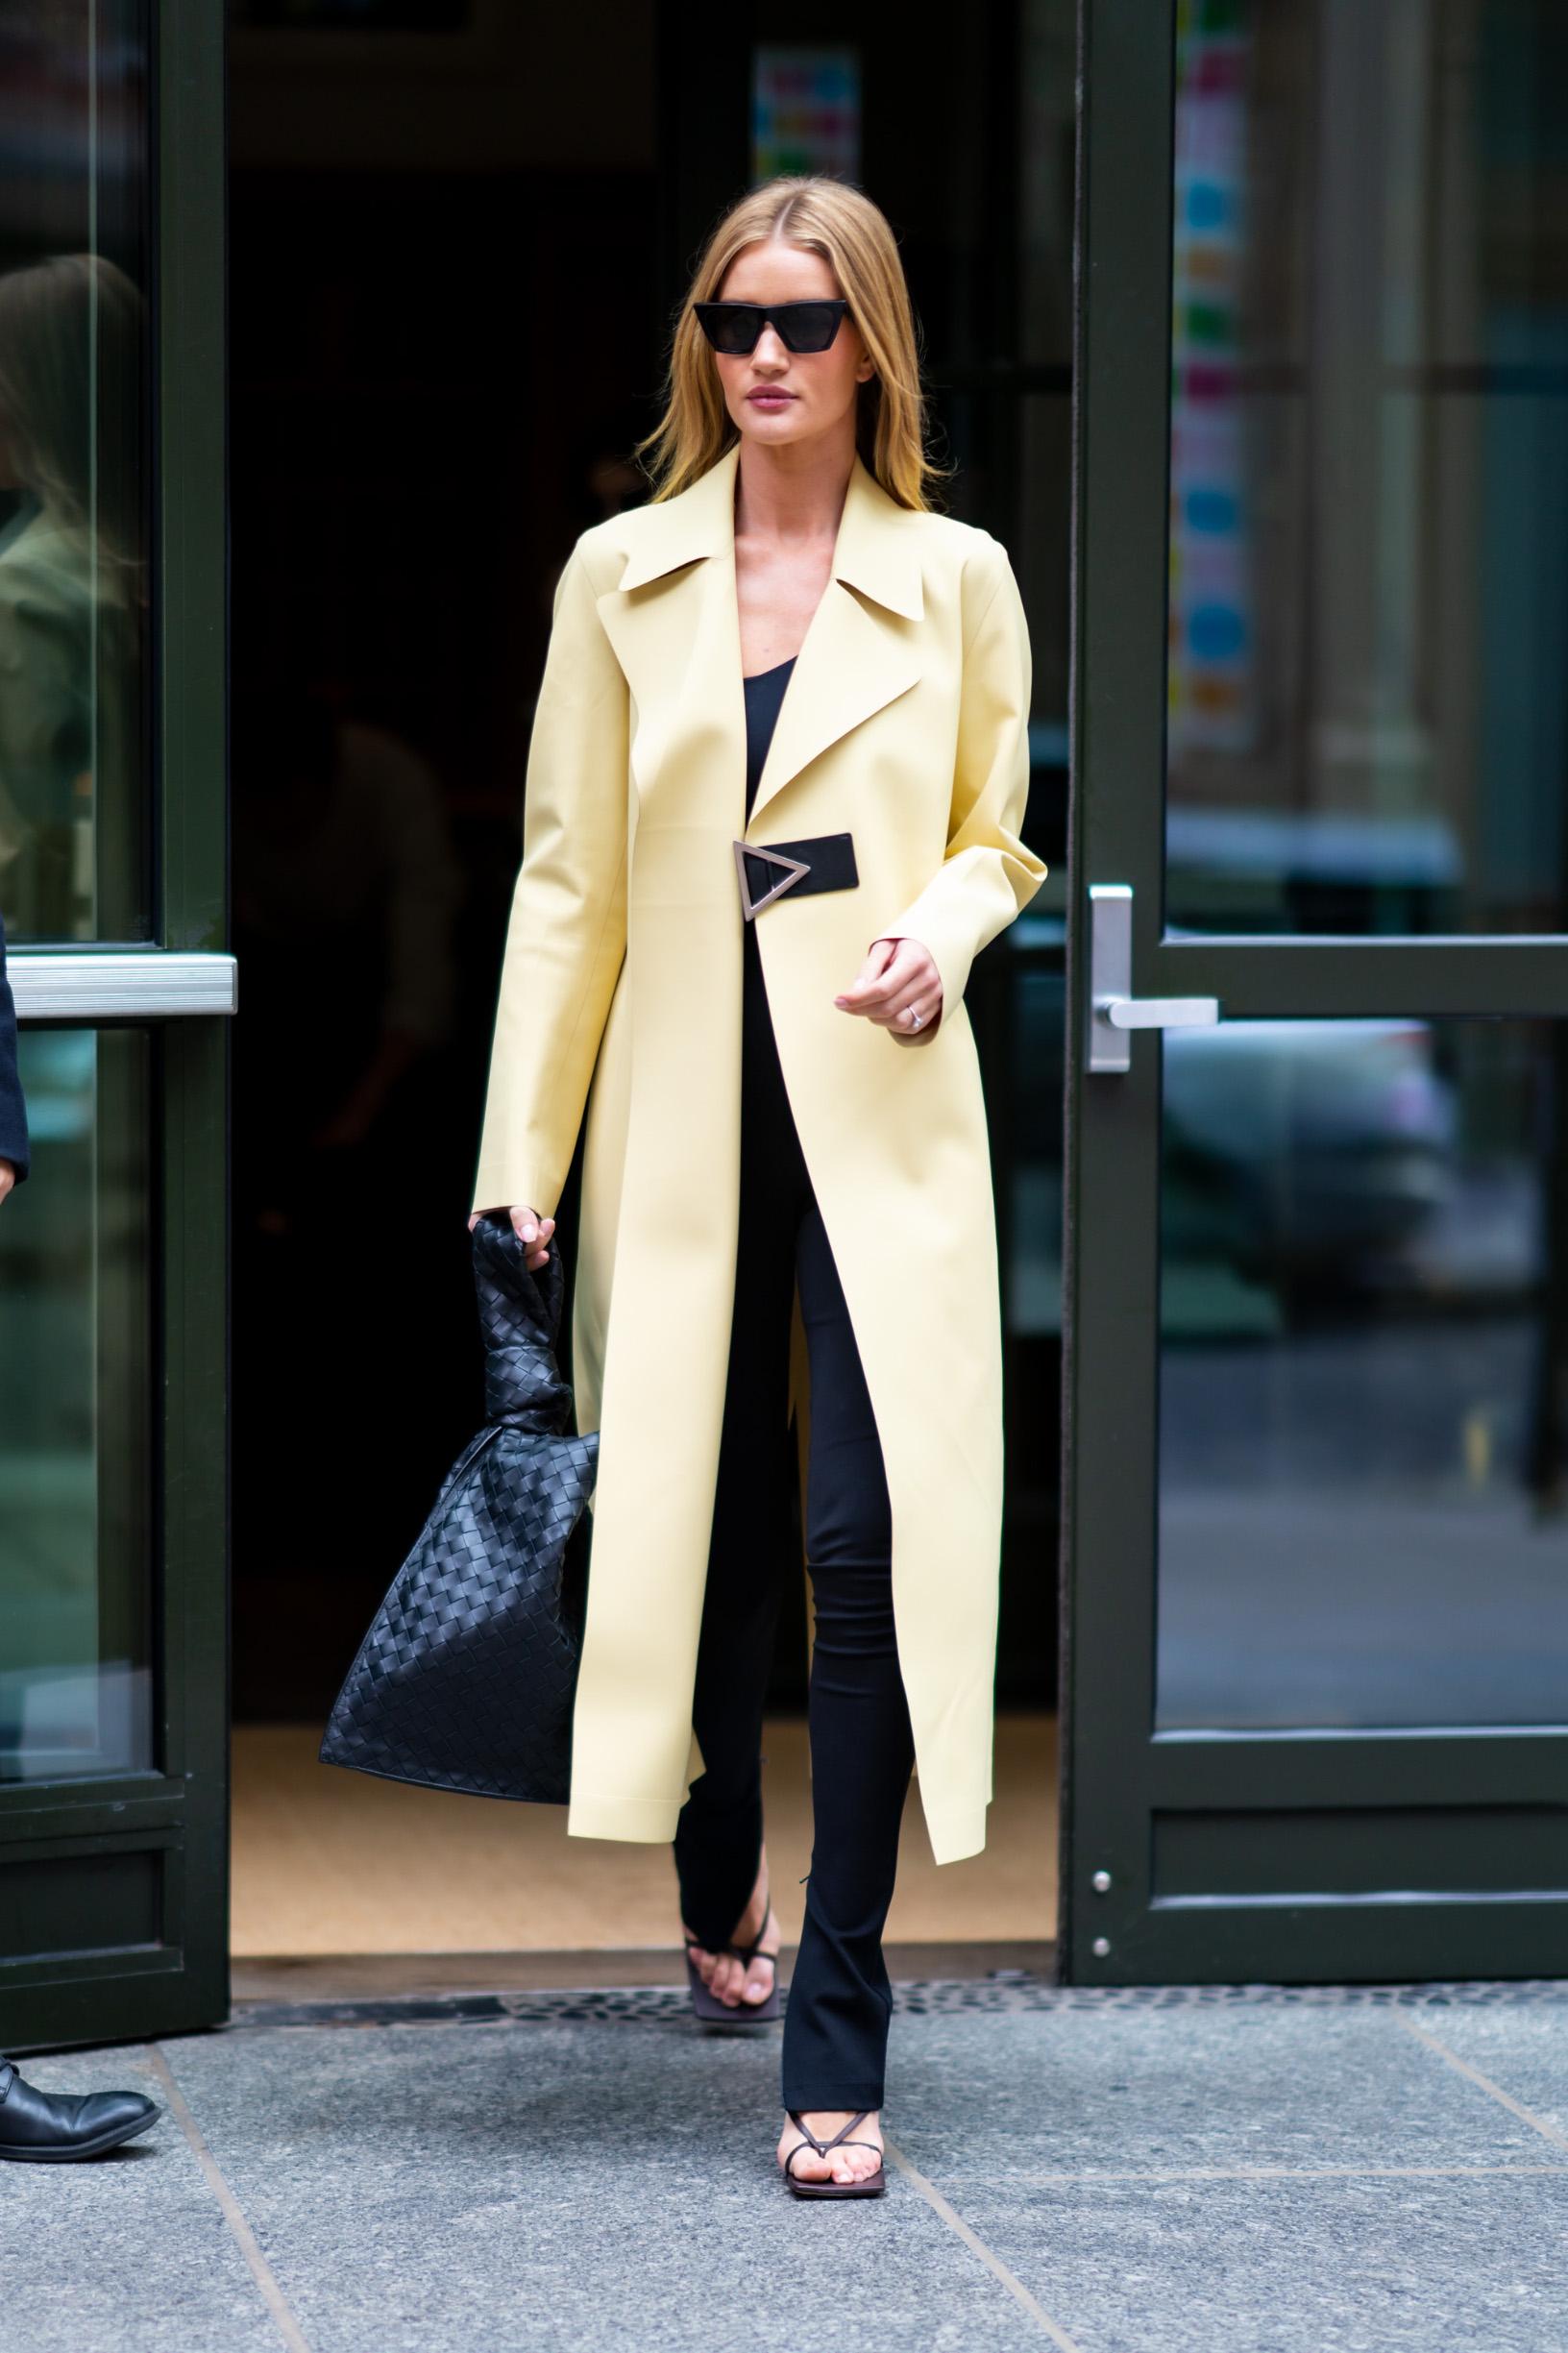 NEW YORK, NEW YORK - NOVEMBER 10: Rosie Huntington-Whiteley is seen in SoHo on November 10, 2019 in New York City. (Photo by Gotham/GC Images)